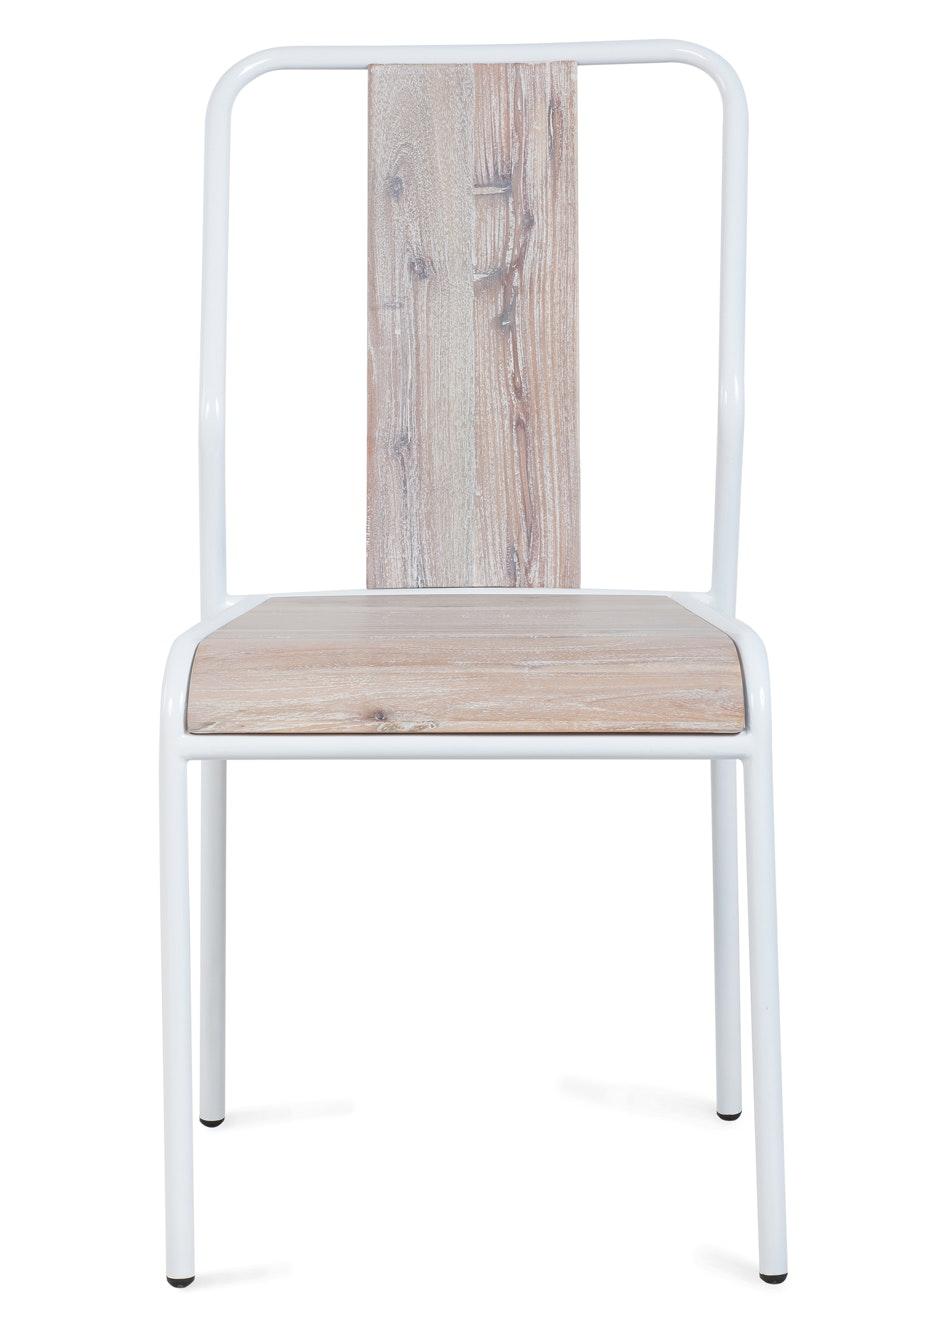 Furniture By Design - Soli Acacia Chair